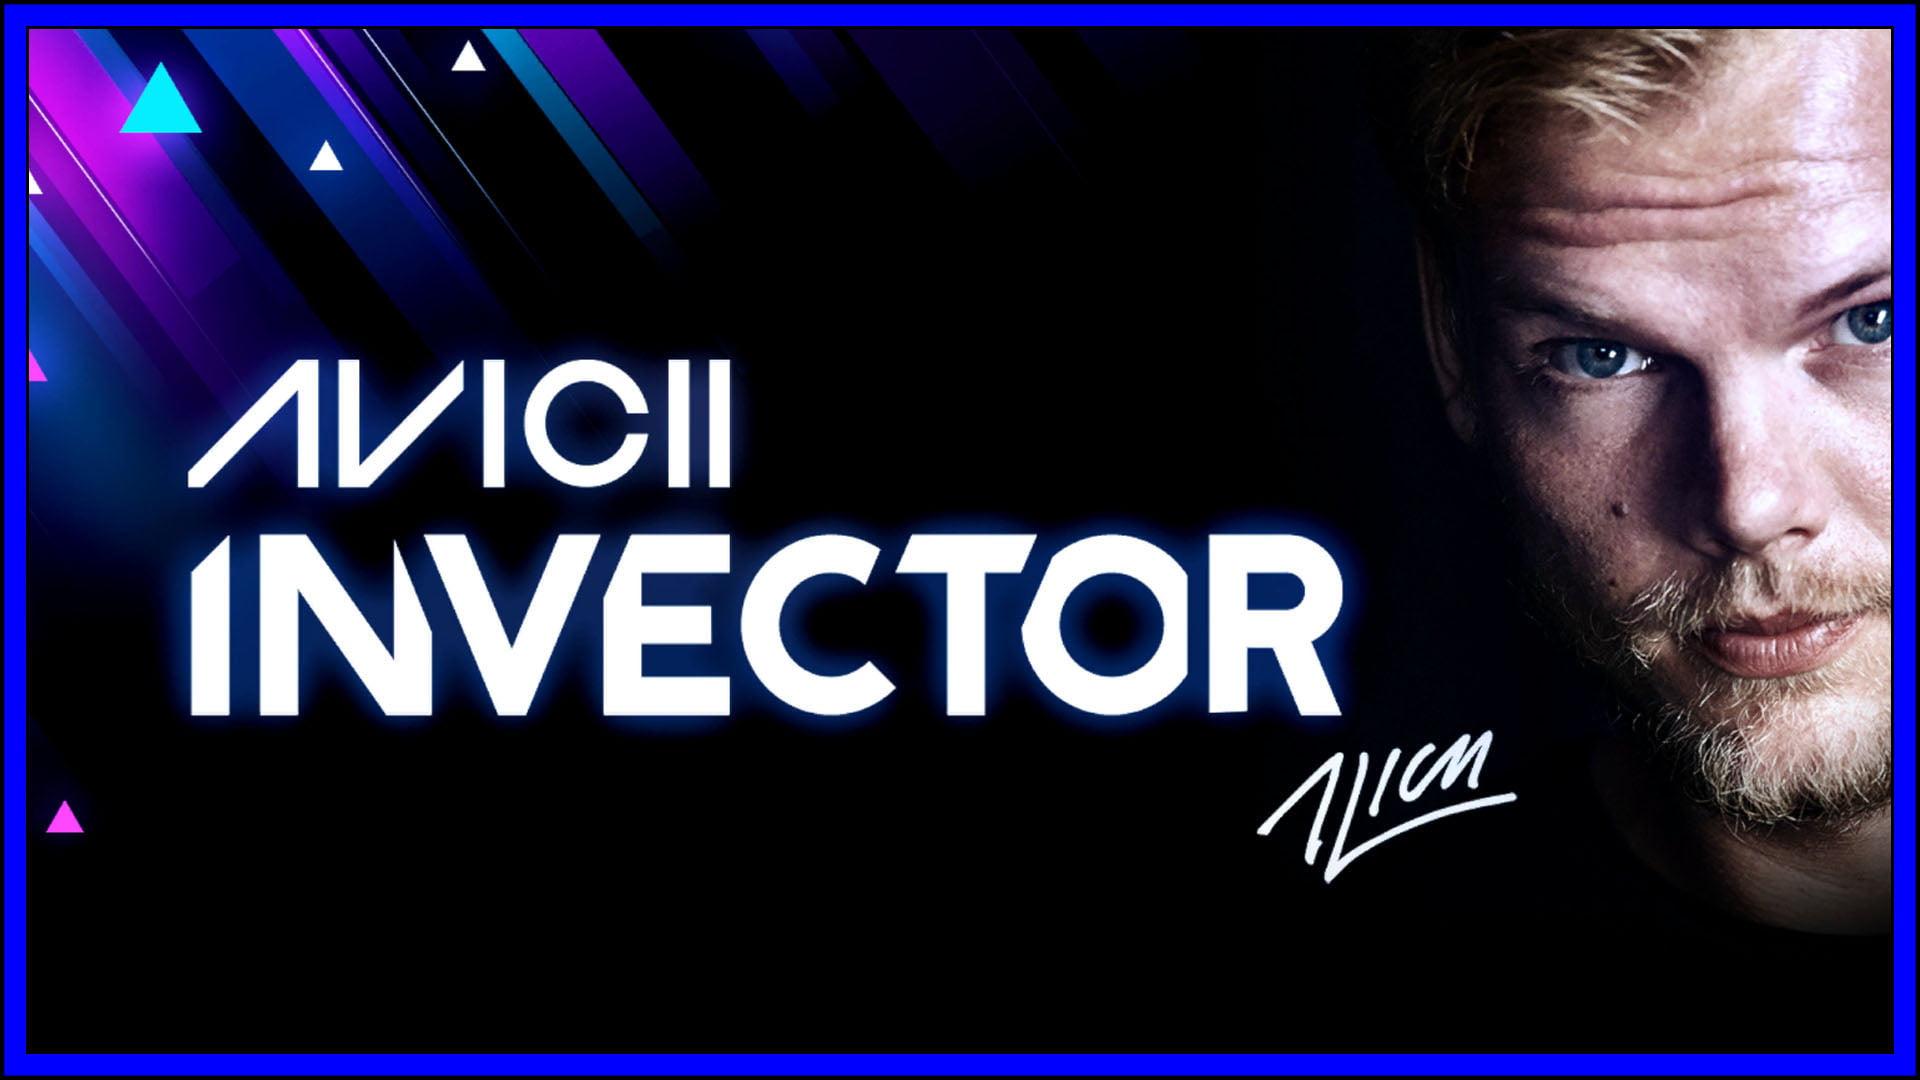 AVICII Invector Fi3